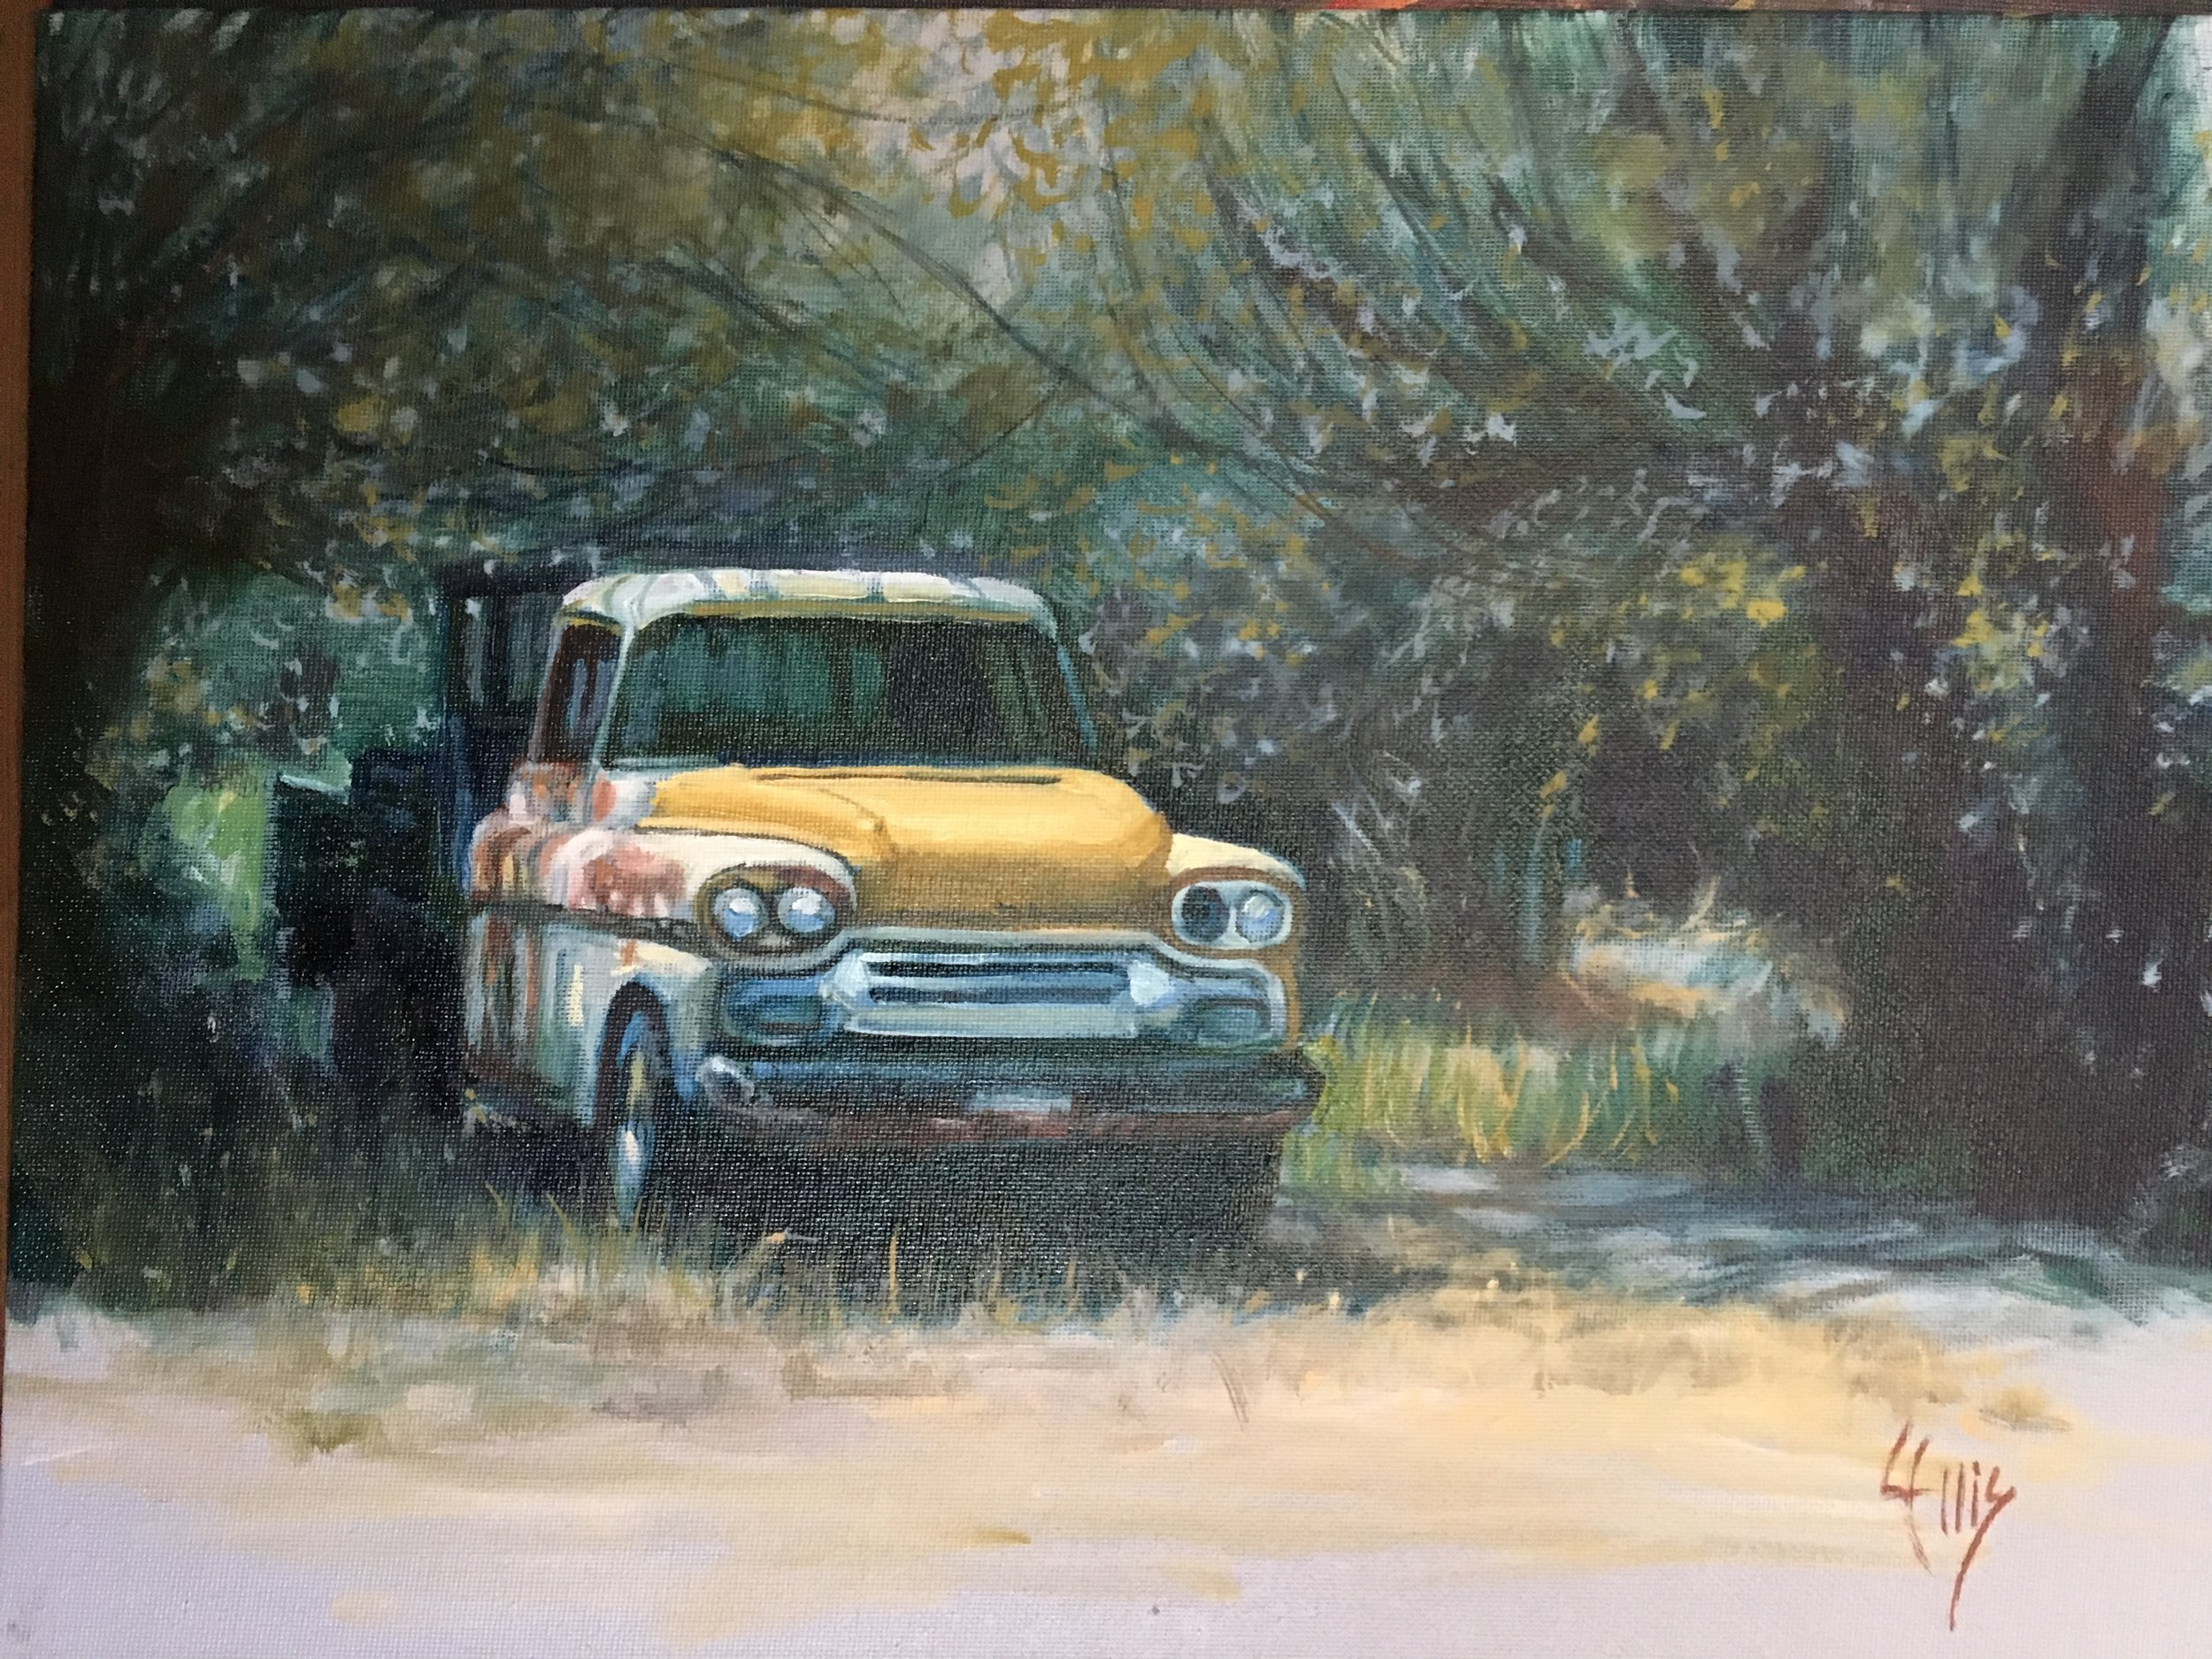 """'58 Chevy Truck"" 12"" x 16"" oil on linen, $750"